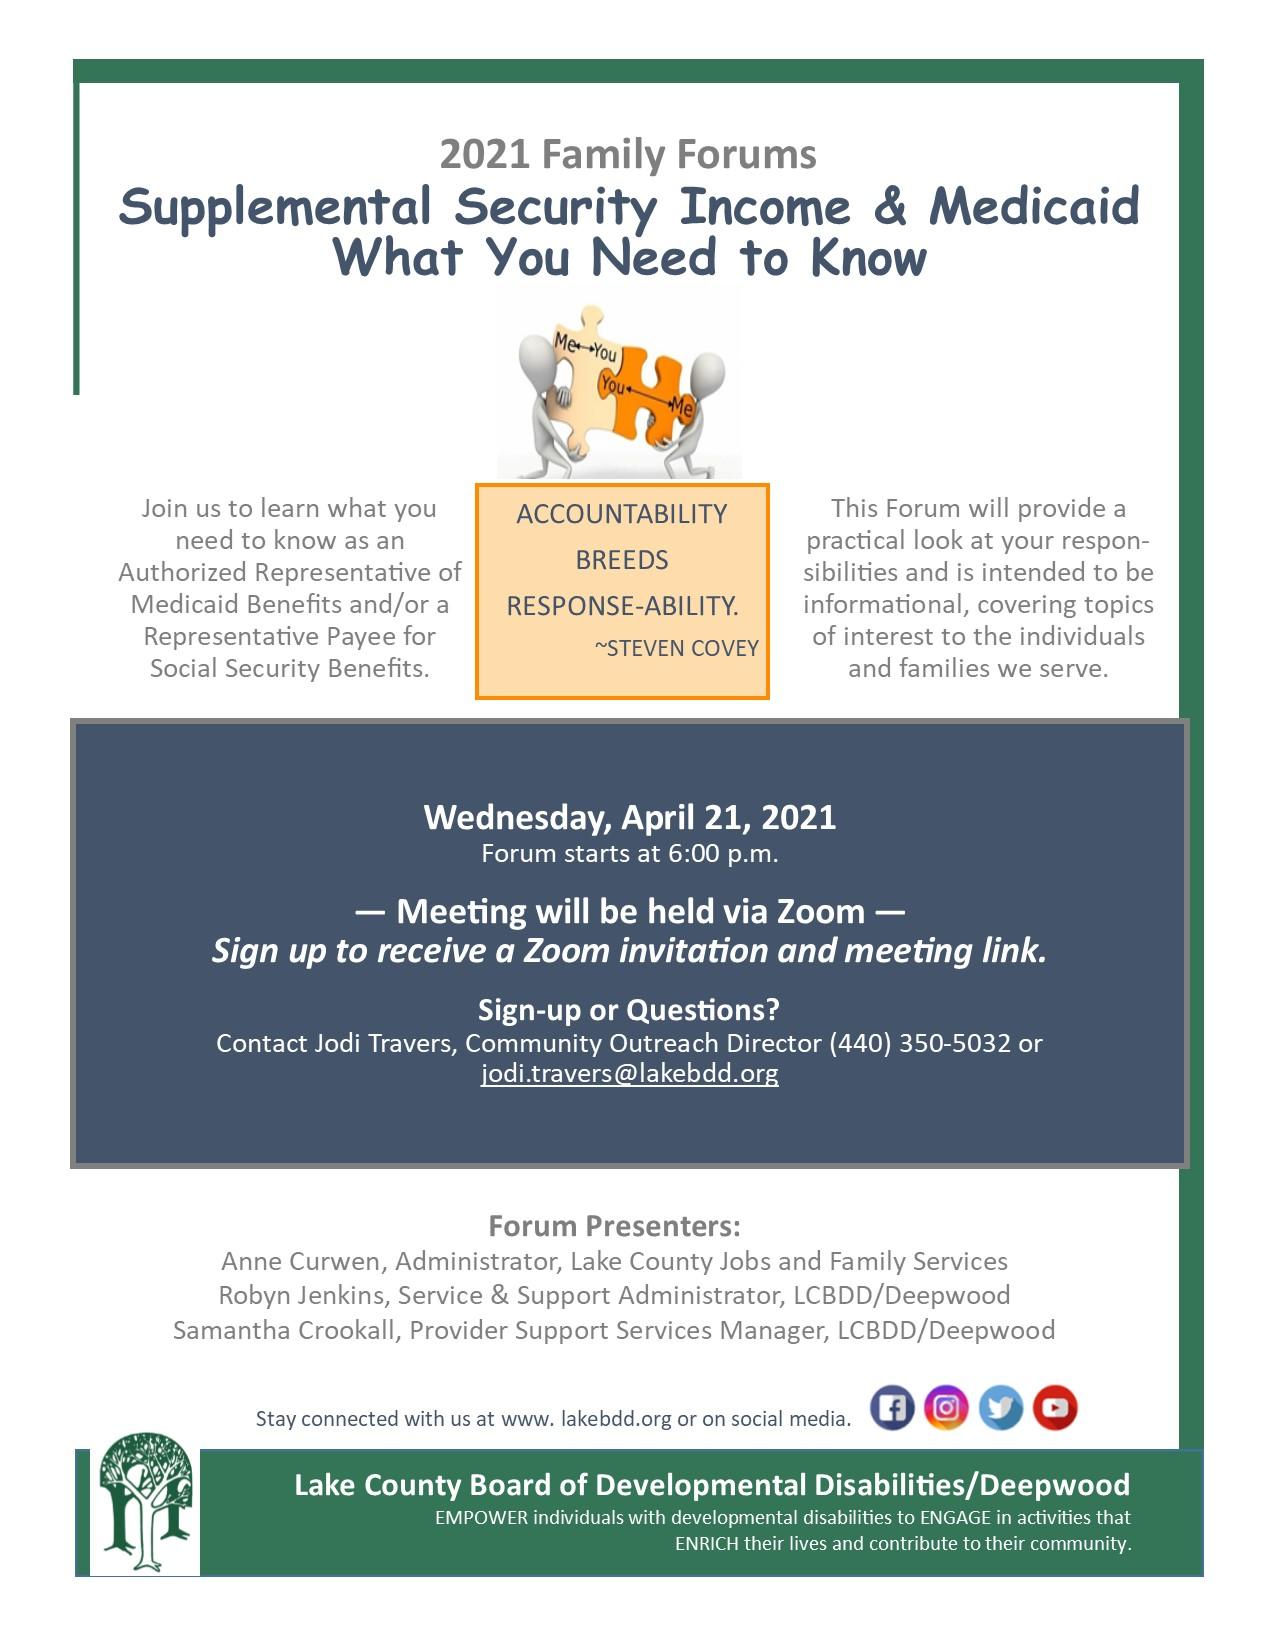 Family Forum – SSI & Medicaid